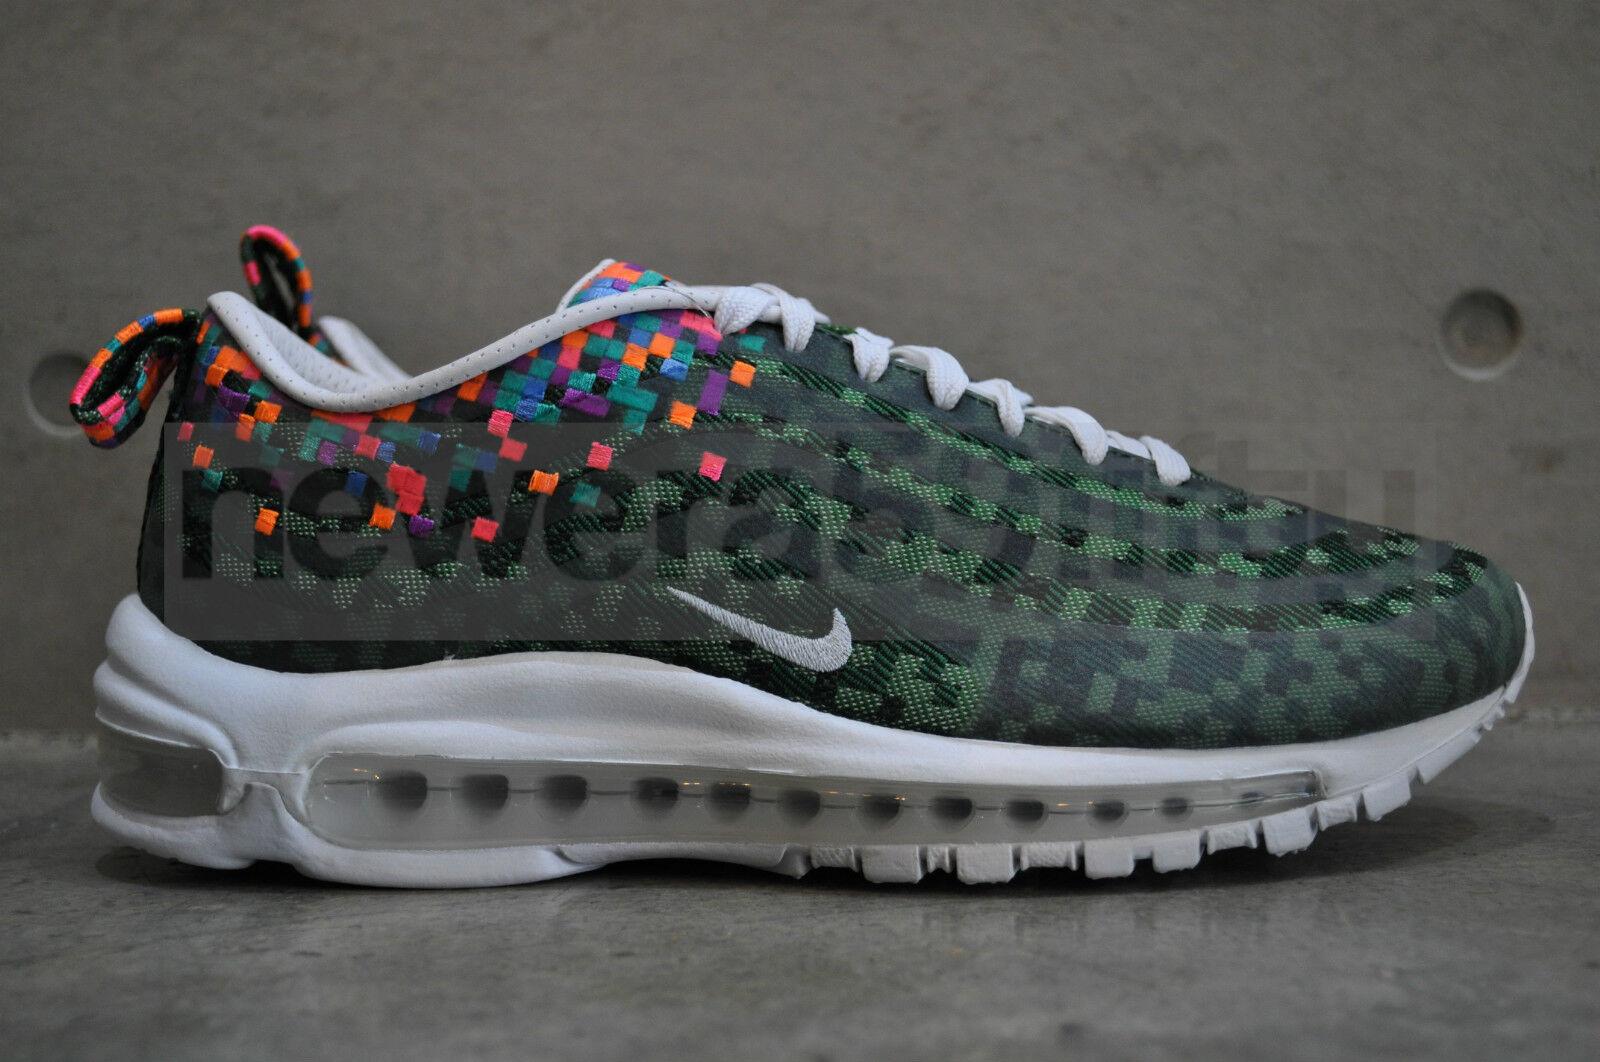 outlet Nike Air Max 97 SP JCRD 'Rio' Pn GreenPn Grn Grg